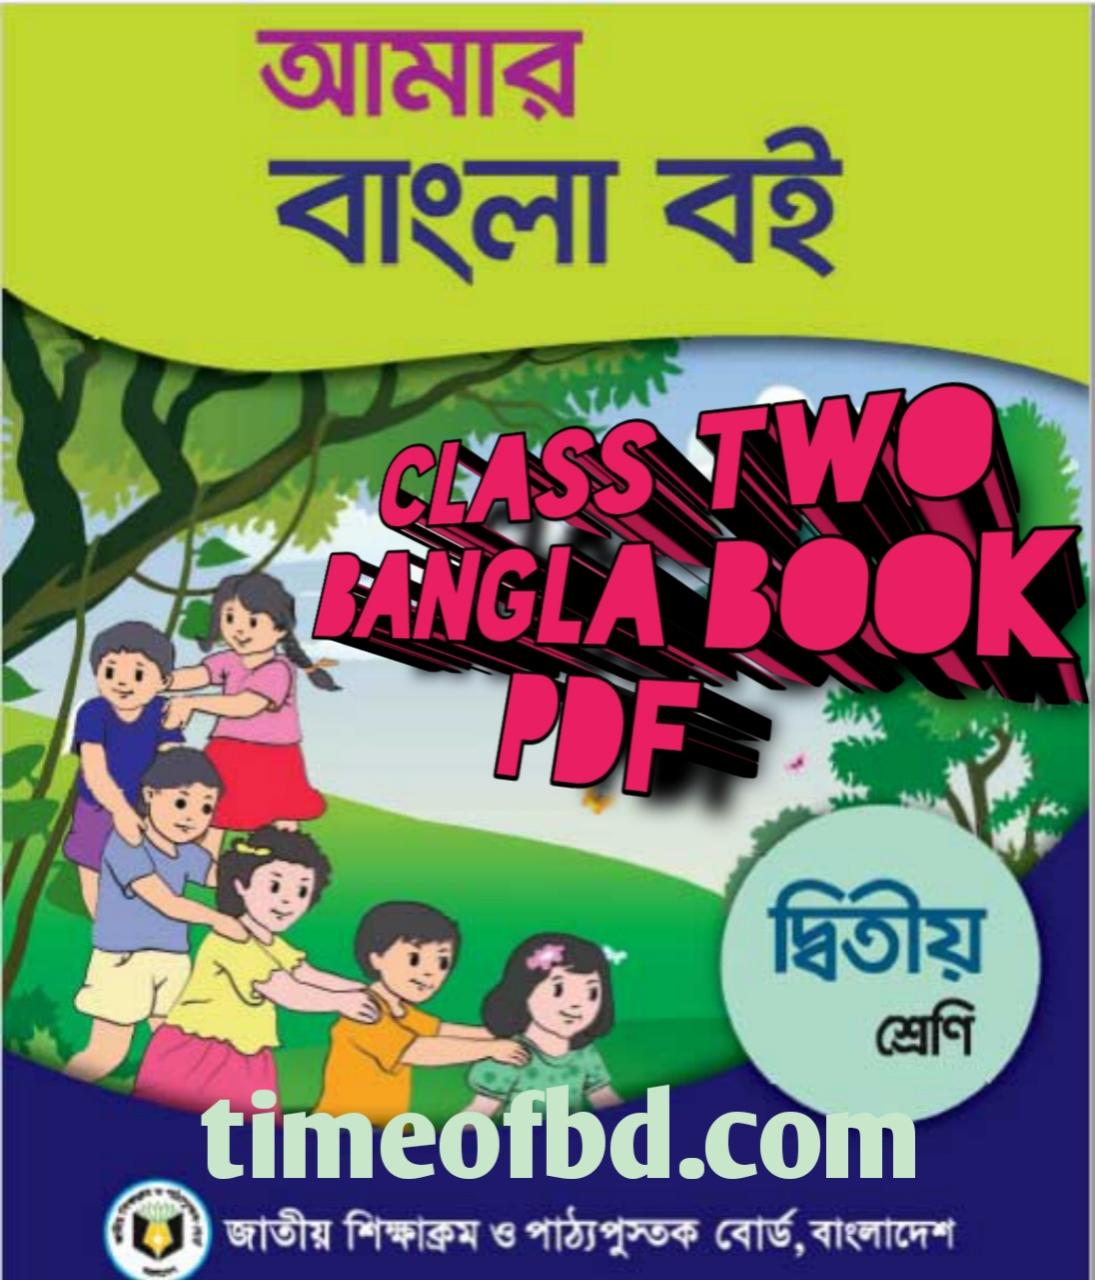 Class 2 bangla book 2021, class 2 bangla book pdf, class 2 bangla question, class 2 bangla boi, class two bangla book 2021, class two bangla book pdf, class two bangla book nctb, class two bangla guide 2021, class two bangla guide pdf, class two bangla note book 2021, class 2 Bangla book pdf in Bengali, nctb book of class two, class 2 Bangla book solution, class 2 guide book pdf, class 2 guide book pdf 2021, বাংলা বই class 2, বাংলা বই pdf, আমার বাংলা বই দ্বিতীয় শ্রেণি, দ্বিতীয় শ্রেণীর বাংলা বই ডাউনলোড, বাংলা বই দ্বিতীয় শ্রেণি, দ্বিতীয় শ্রেণির বাংলা বই ২০২১, দ্বিতীয় শ্রেণীর বাংলা বই পিডিএফ, দ্বিতীয় শ্রেণির বাংলা বই pdf 2021, দ্বিতীয় শ্রেণীর বাংলা গাইড, দ্বিতীয় শ্রেণীর বাংলা গাইড পিডিএফ, দ্বিতীয় শ্রেণীর বাংলা গাইড pdf 2021, ২য় শ্রেণীর বাংলা বই গাইড, দ্বিতীয় শ্রেণীর বাংলা গাইড ডাউনলোড, আমার বাংলা বই দ্বিতীয় শ্রেণি, একের ভিতর সব দ্বিতীয় শ্রেণি, দ্বিতীয় শ্রেণীর গাইড বই ডাউনলোড pdf, দ্বিতীয় শ্রেণীর বাংলা বই প্রশ্ন, ২য় শ্রেণির বাংলা বই ২০২১, ২য় শ্রেণির বাংলা কবিতা, দ্বিতীয় শ্রেণীর বাংলা কবিতা,